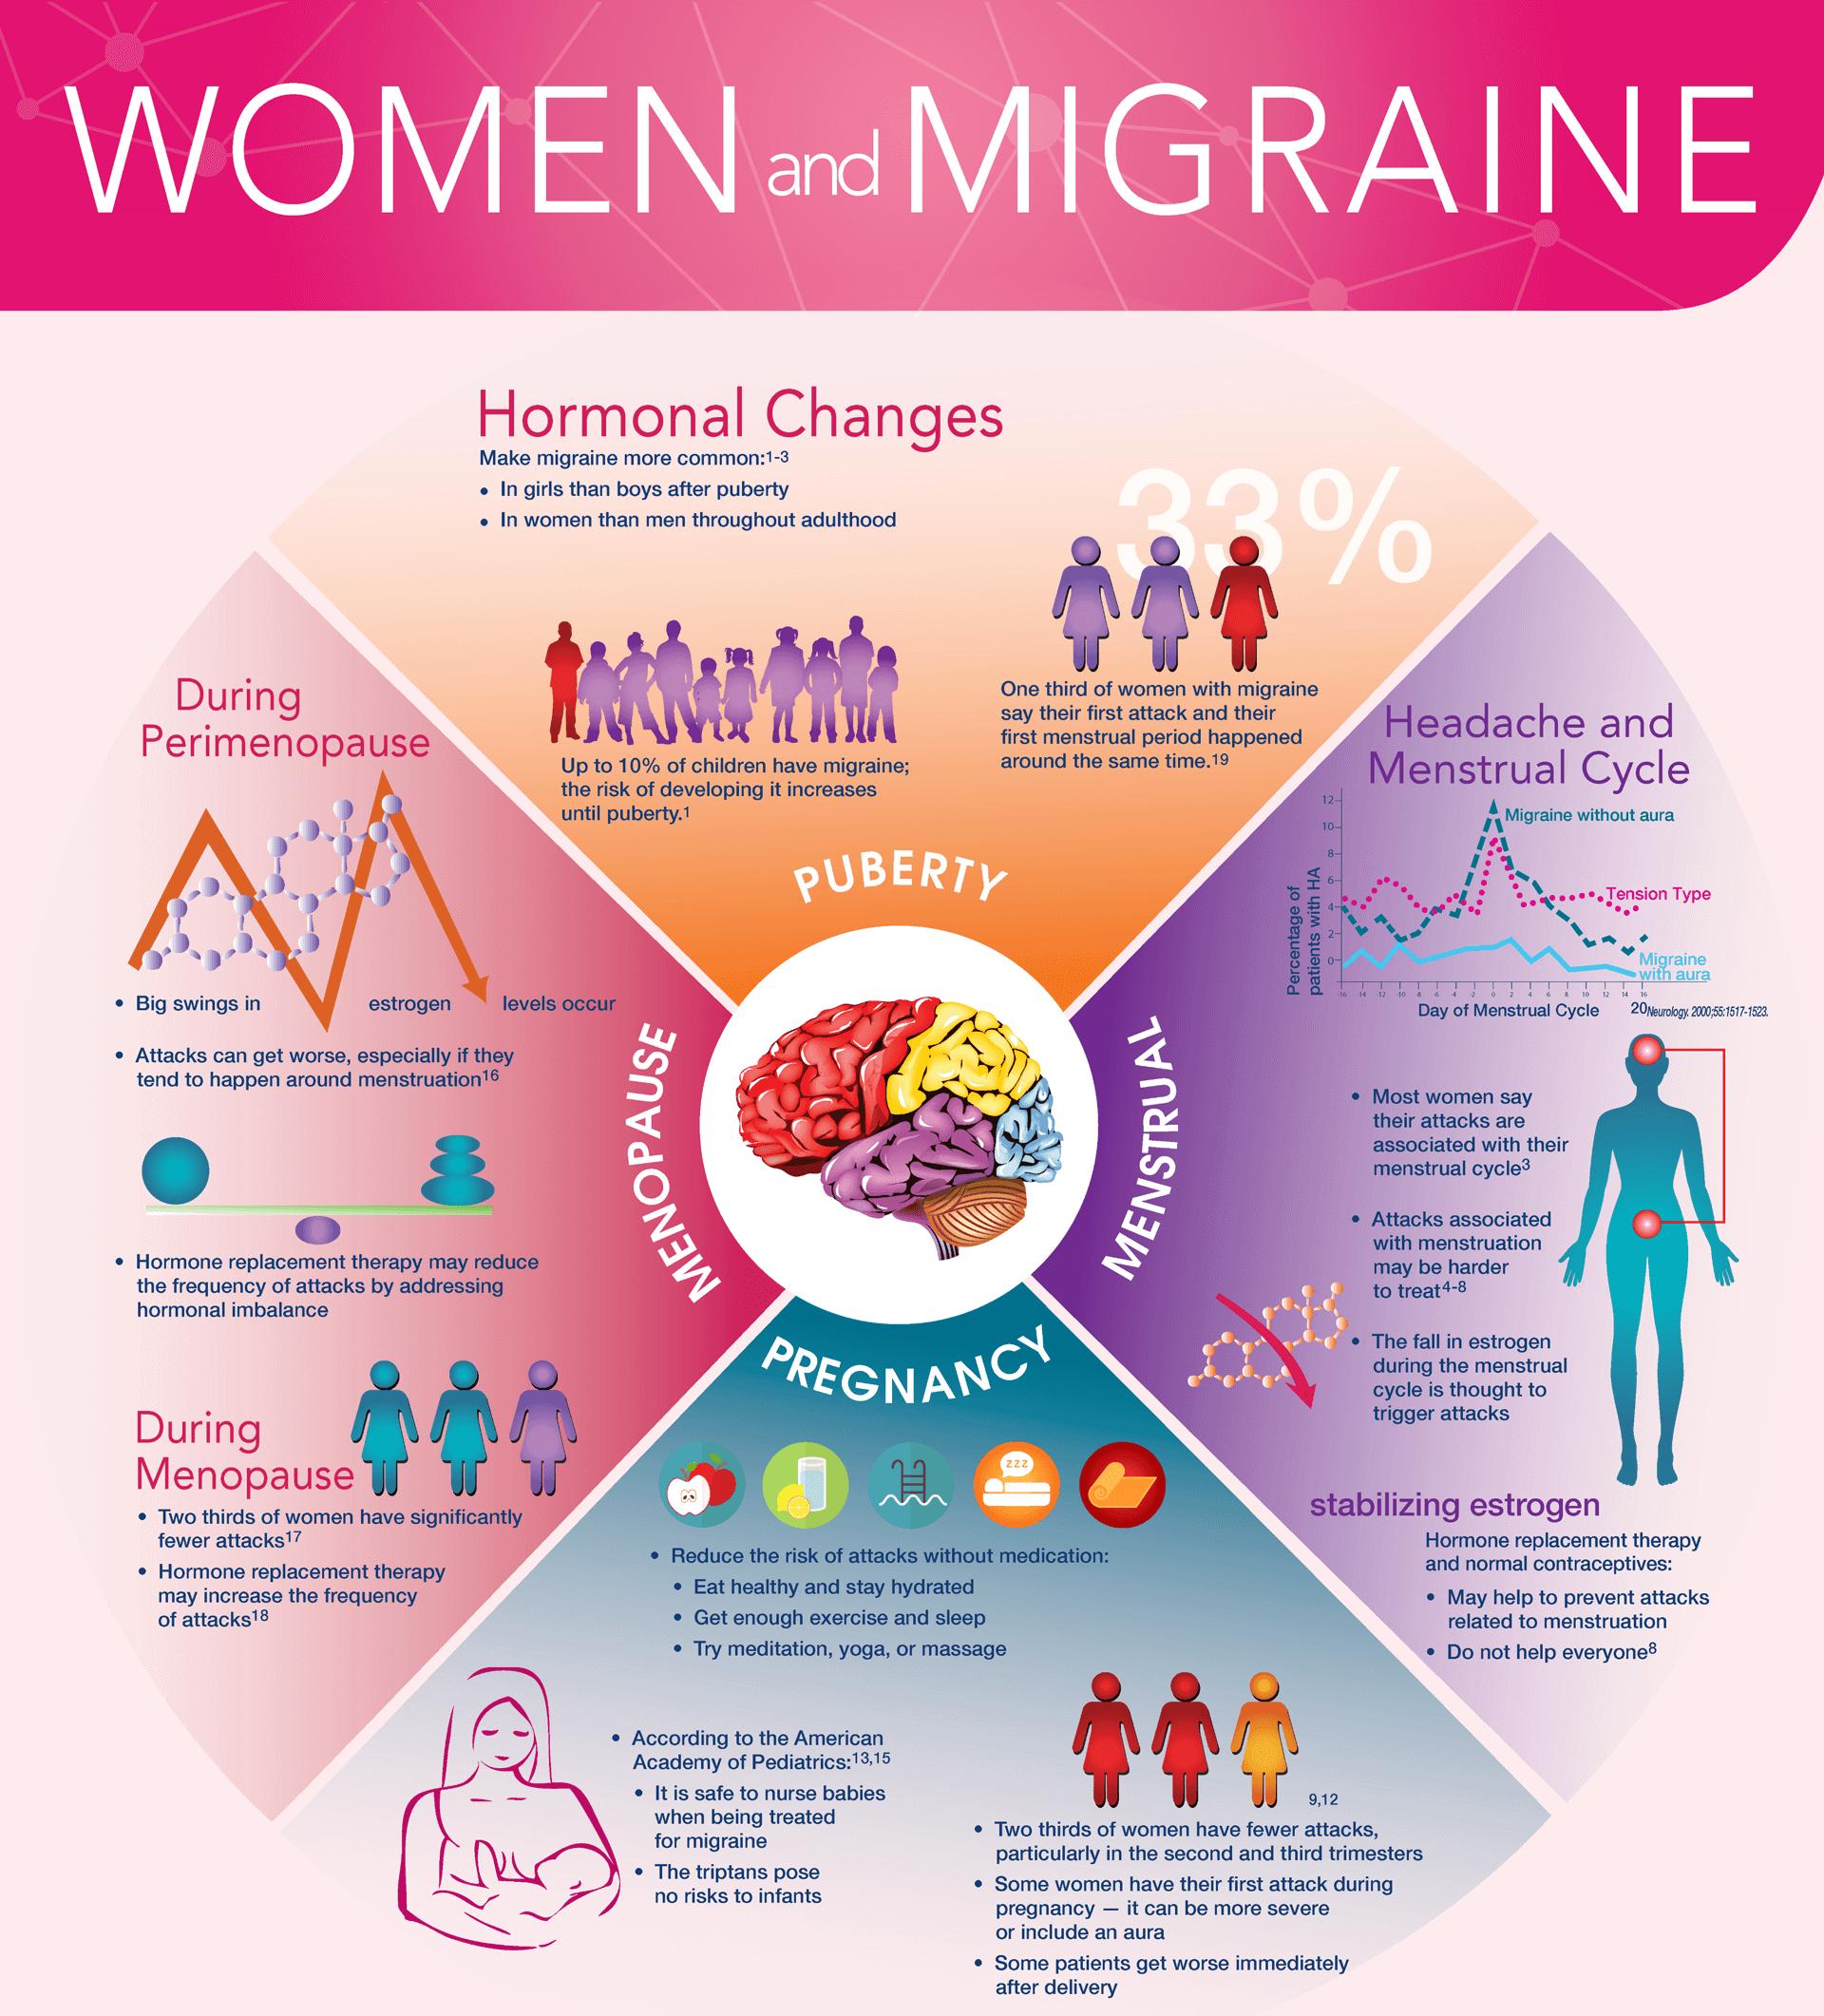 women and migraine infographic